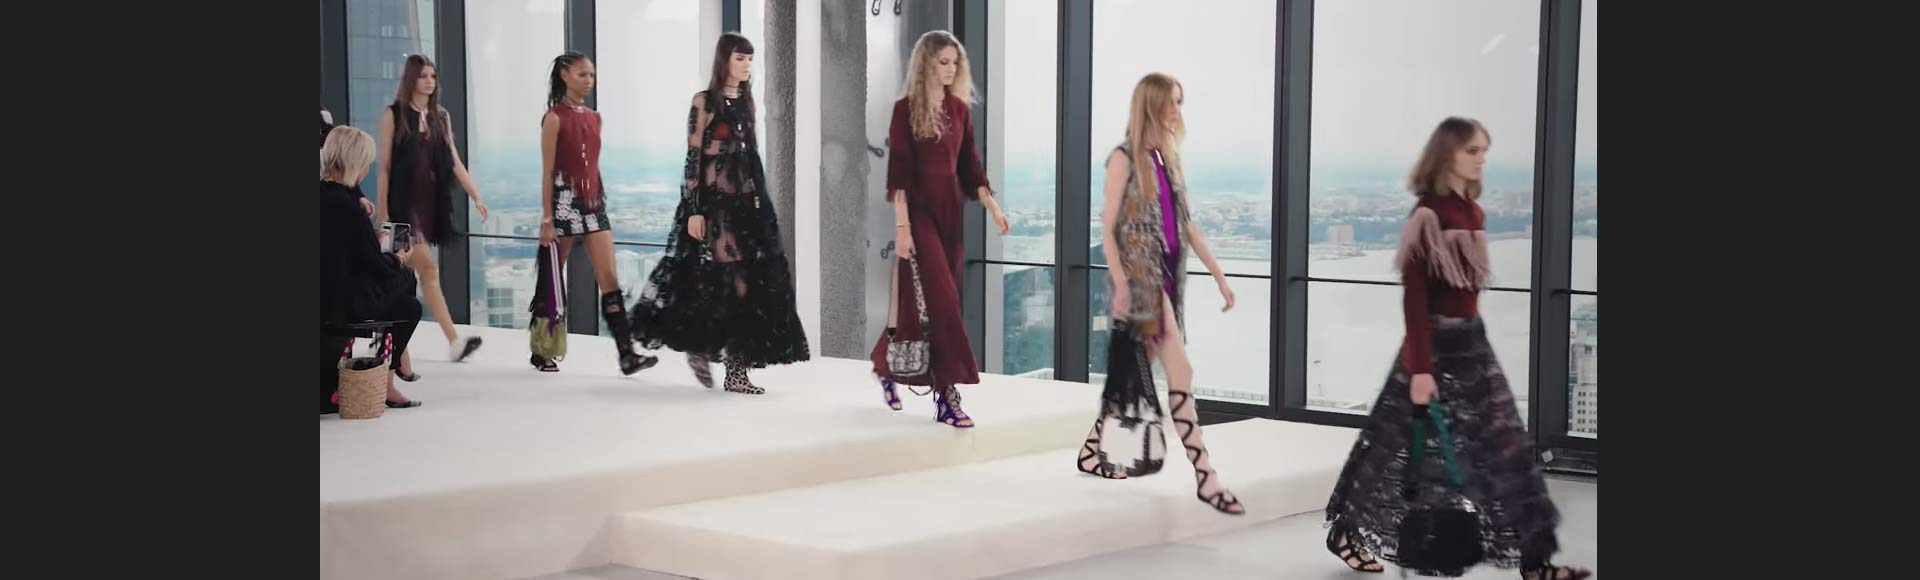 LONGCHAMP'S Spring-Summer 2019 Fashion Show New York